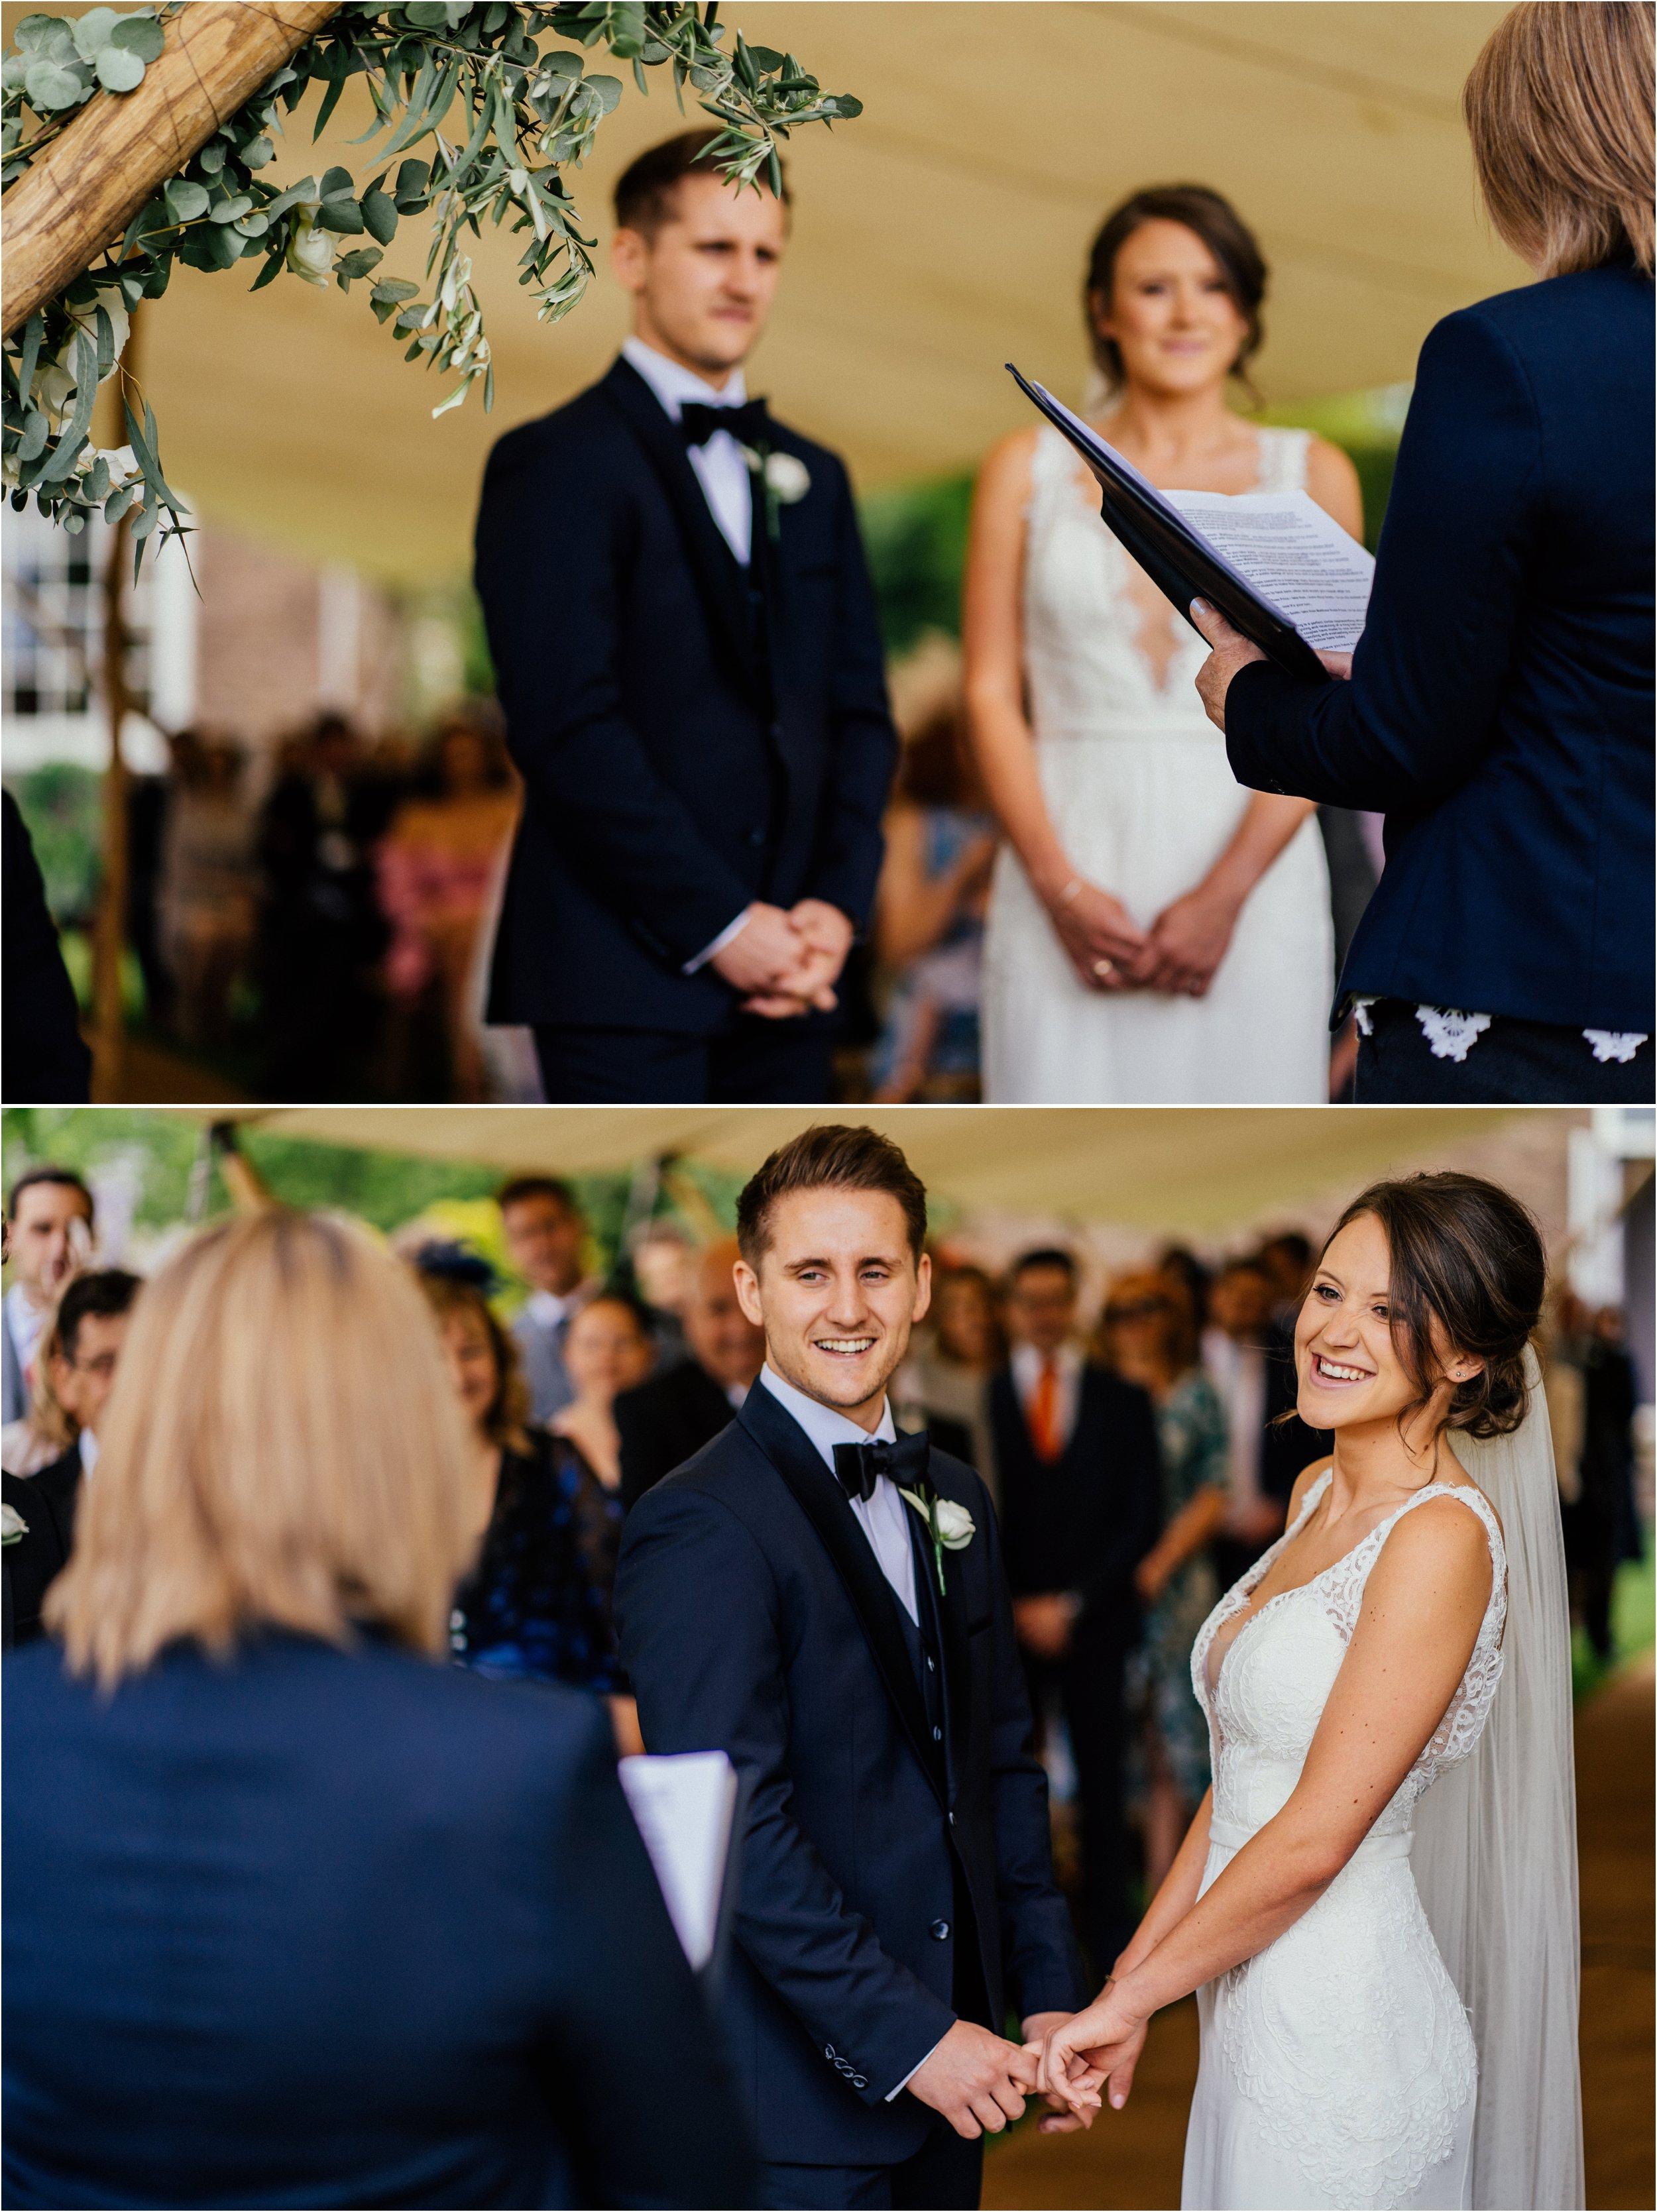 Dewsall Court Herefordshire wedding photographer_0041.jpg